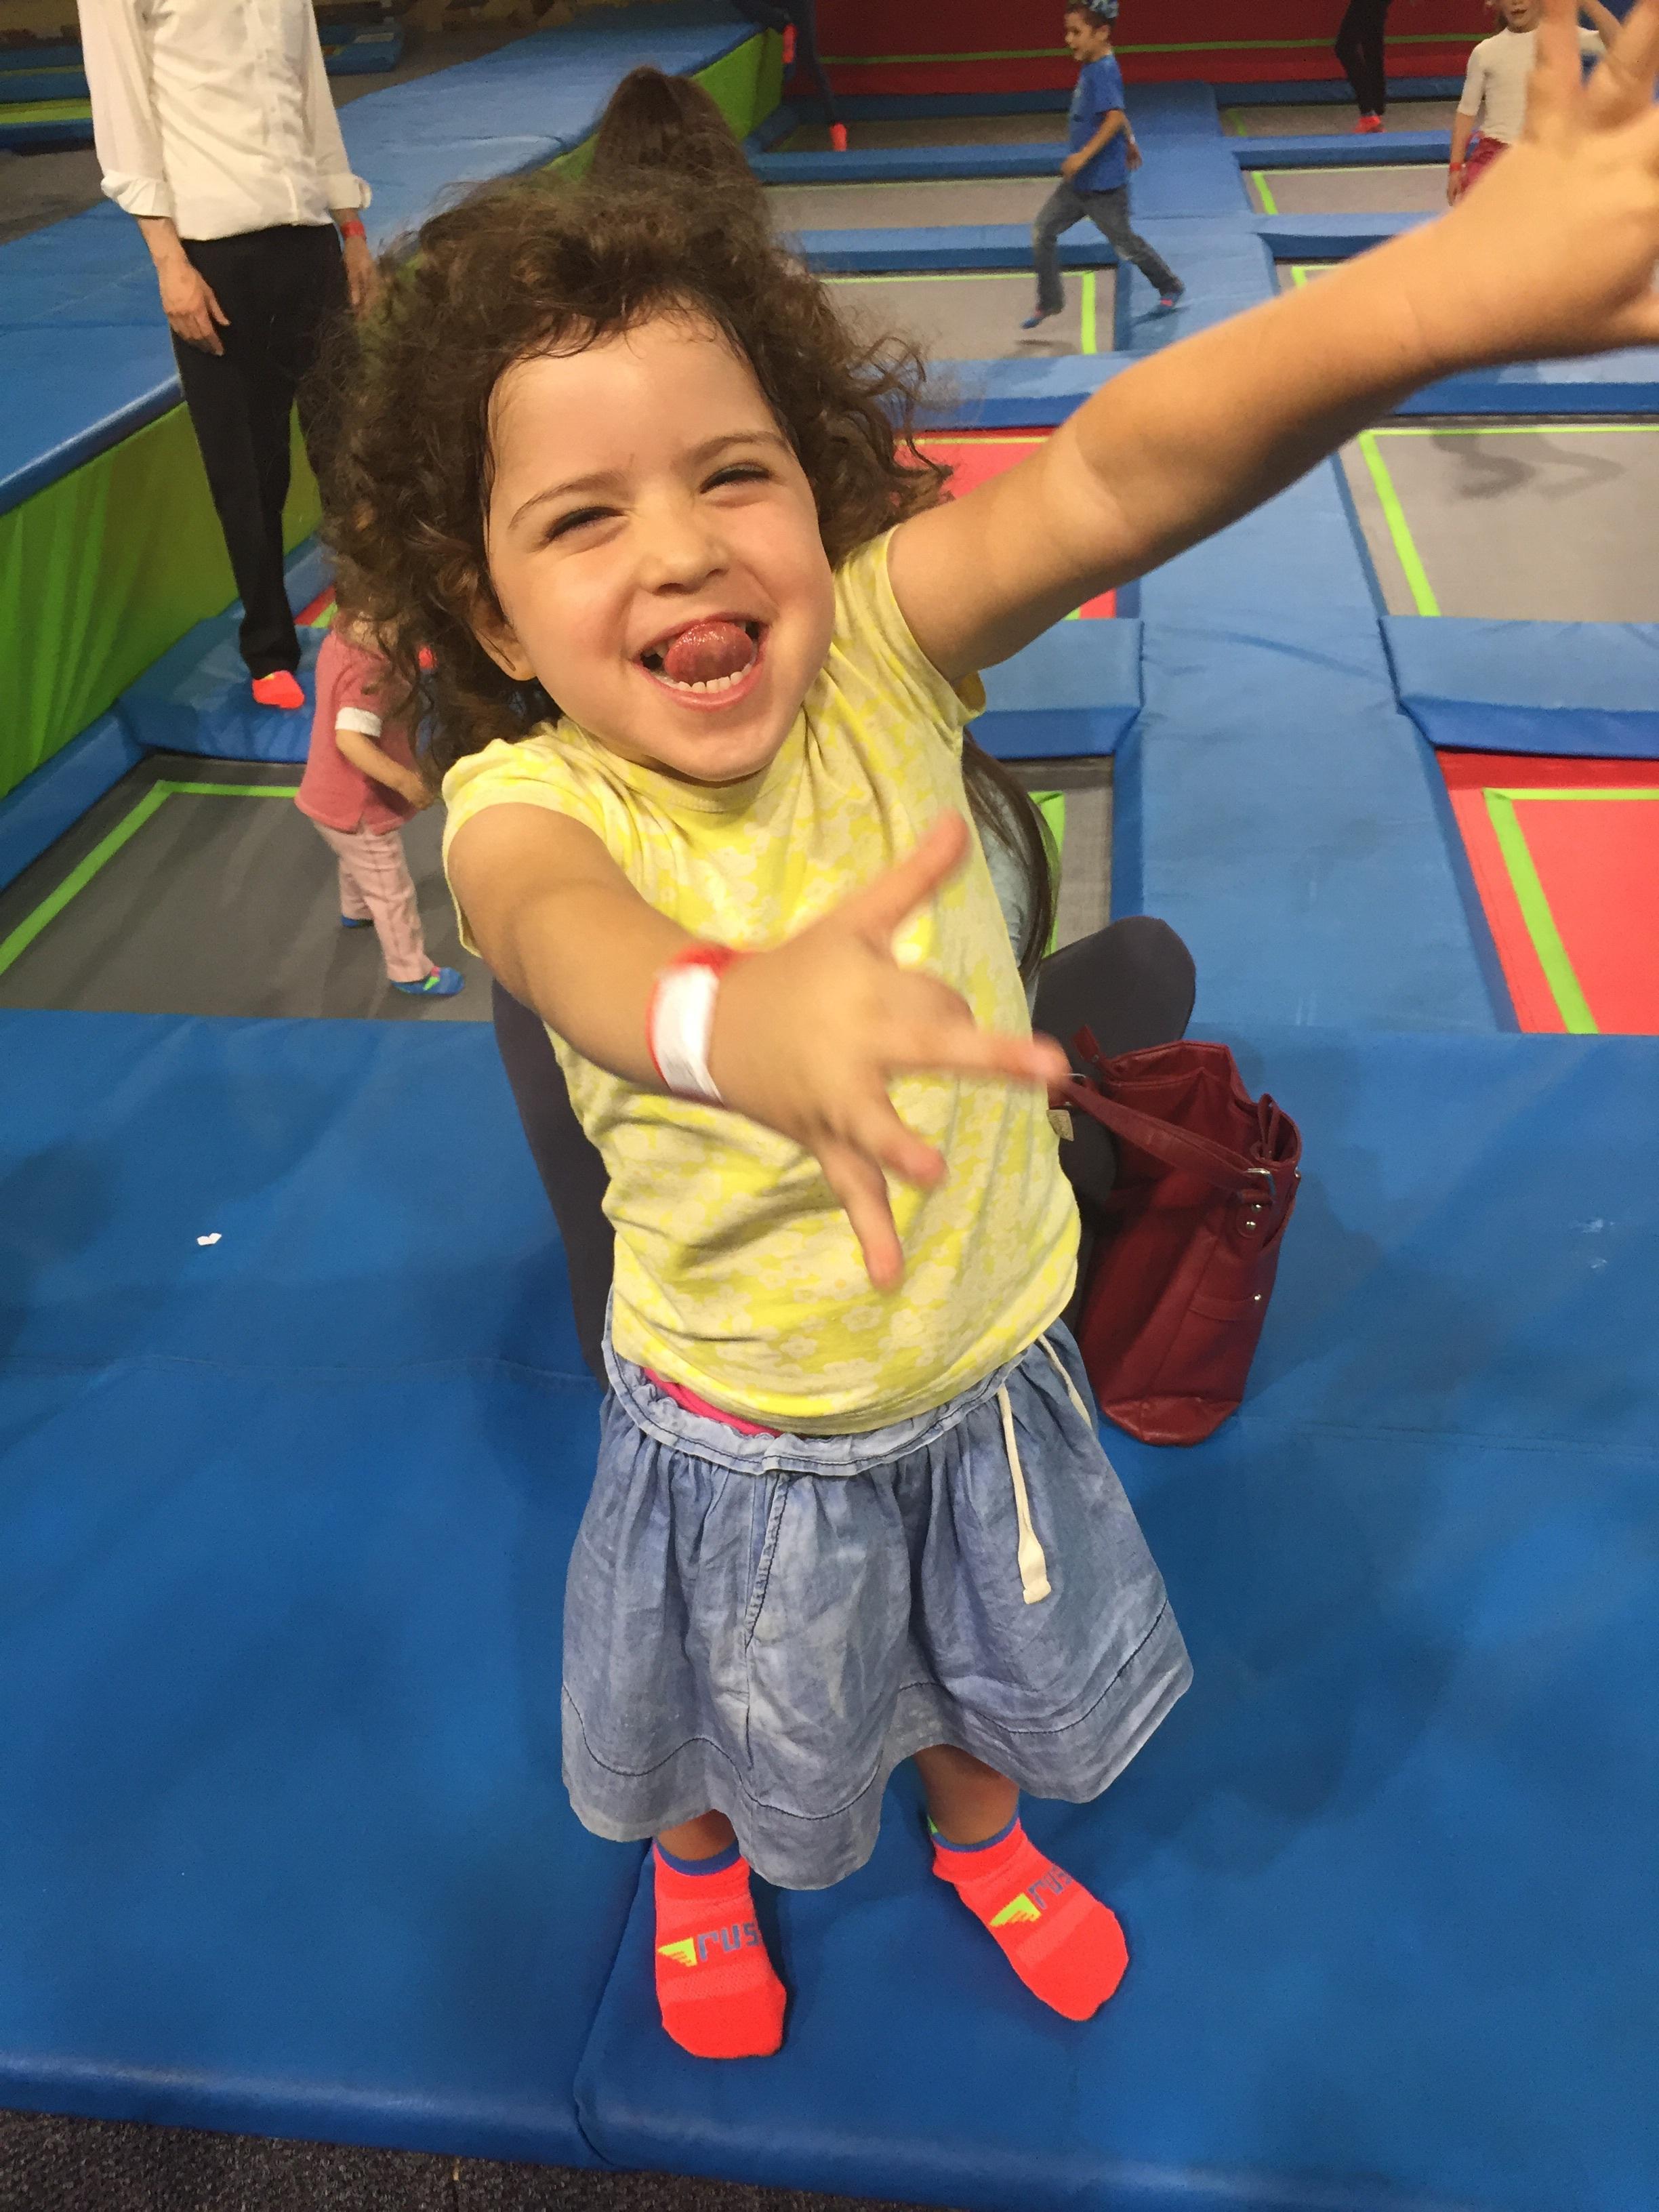 Laya having fun at Rush!